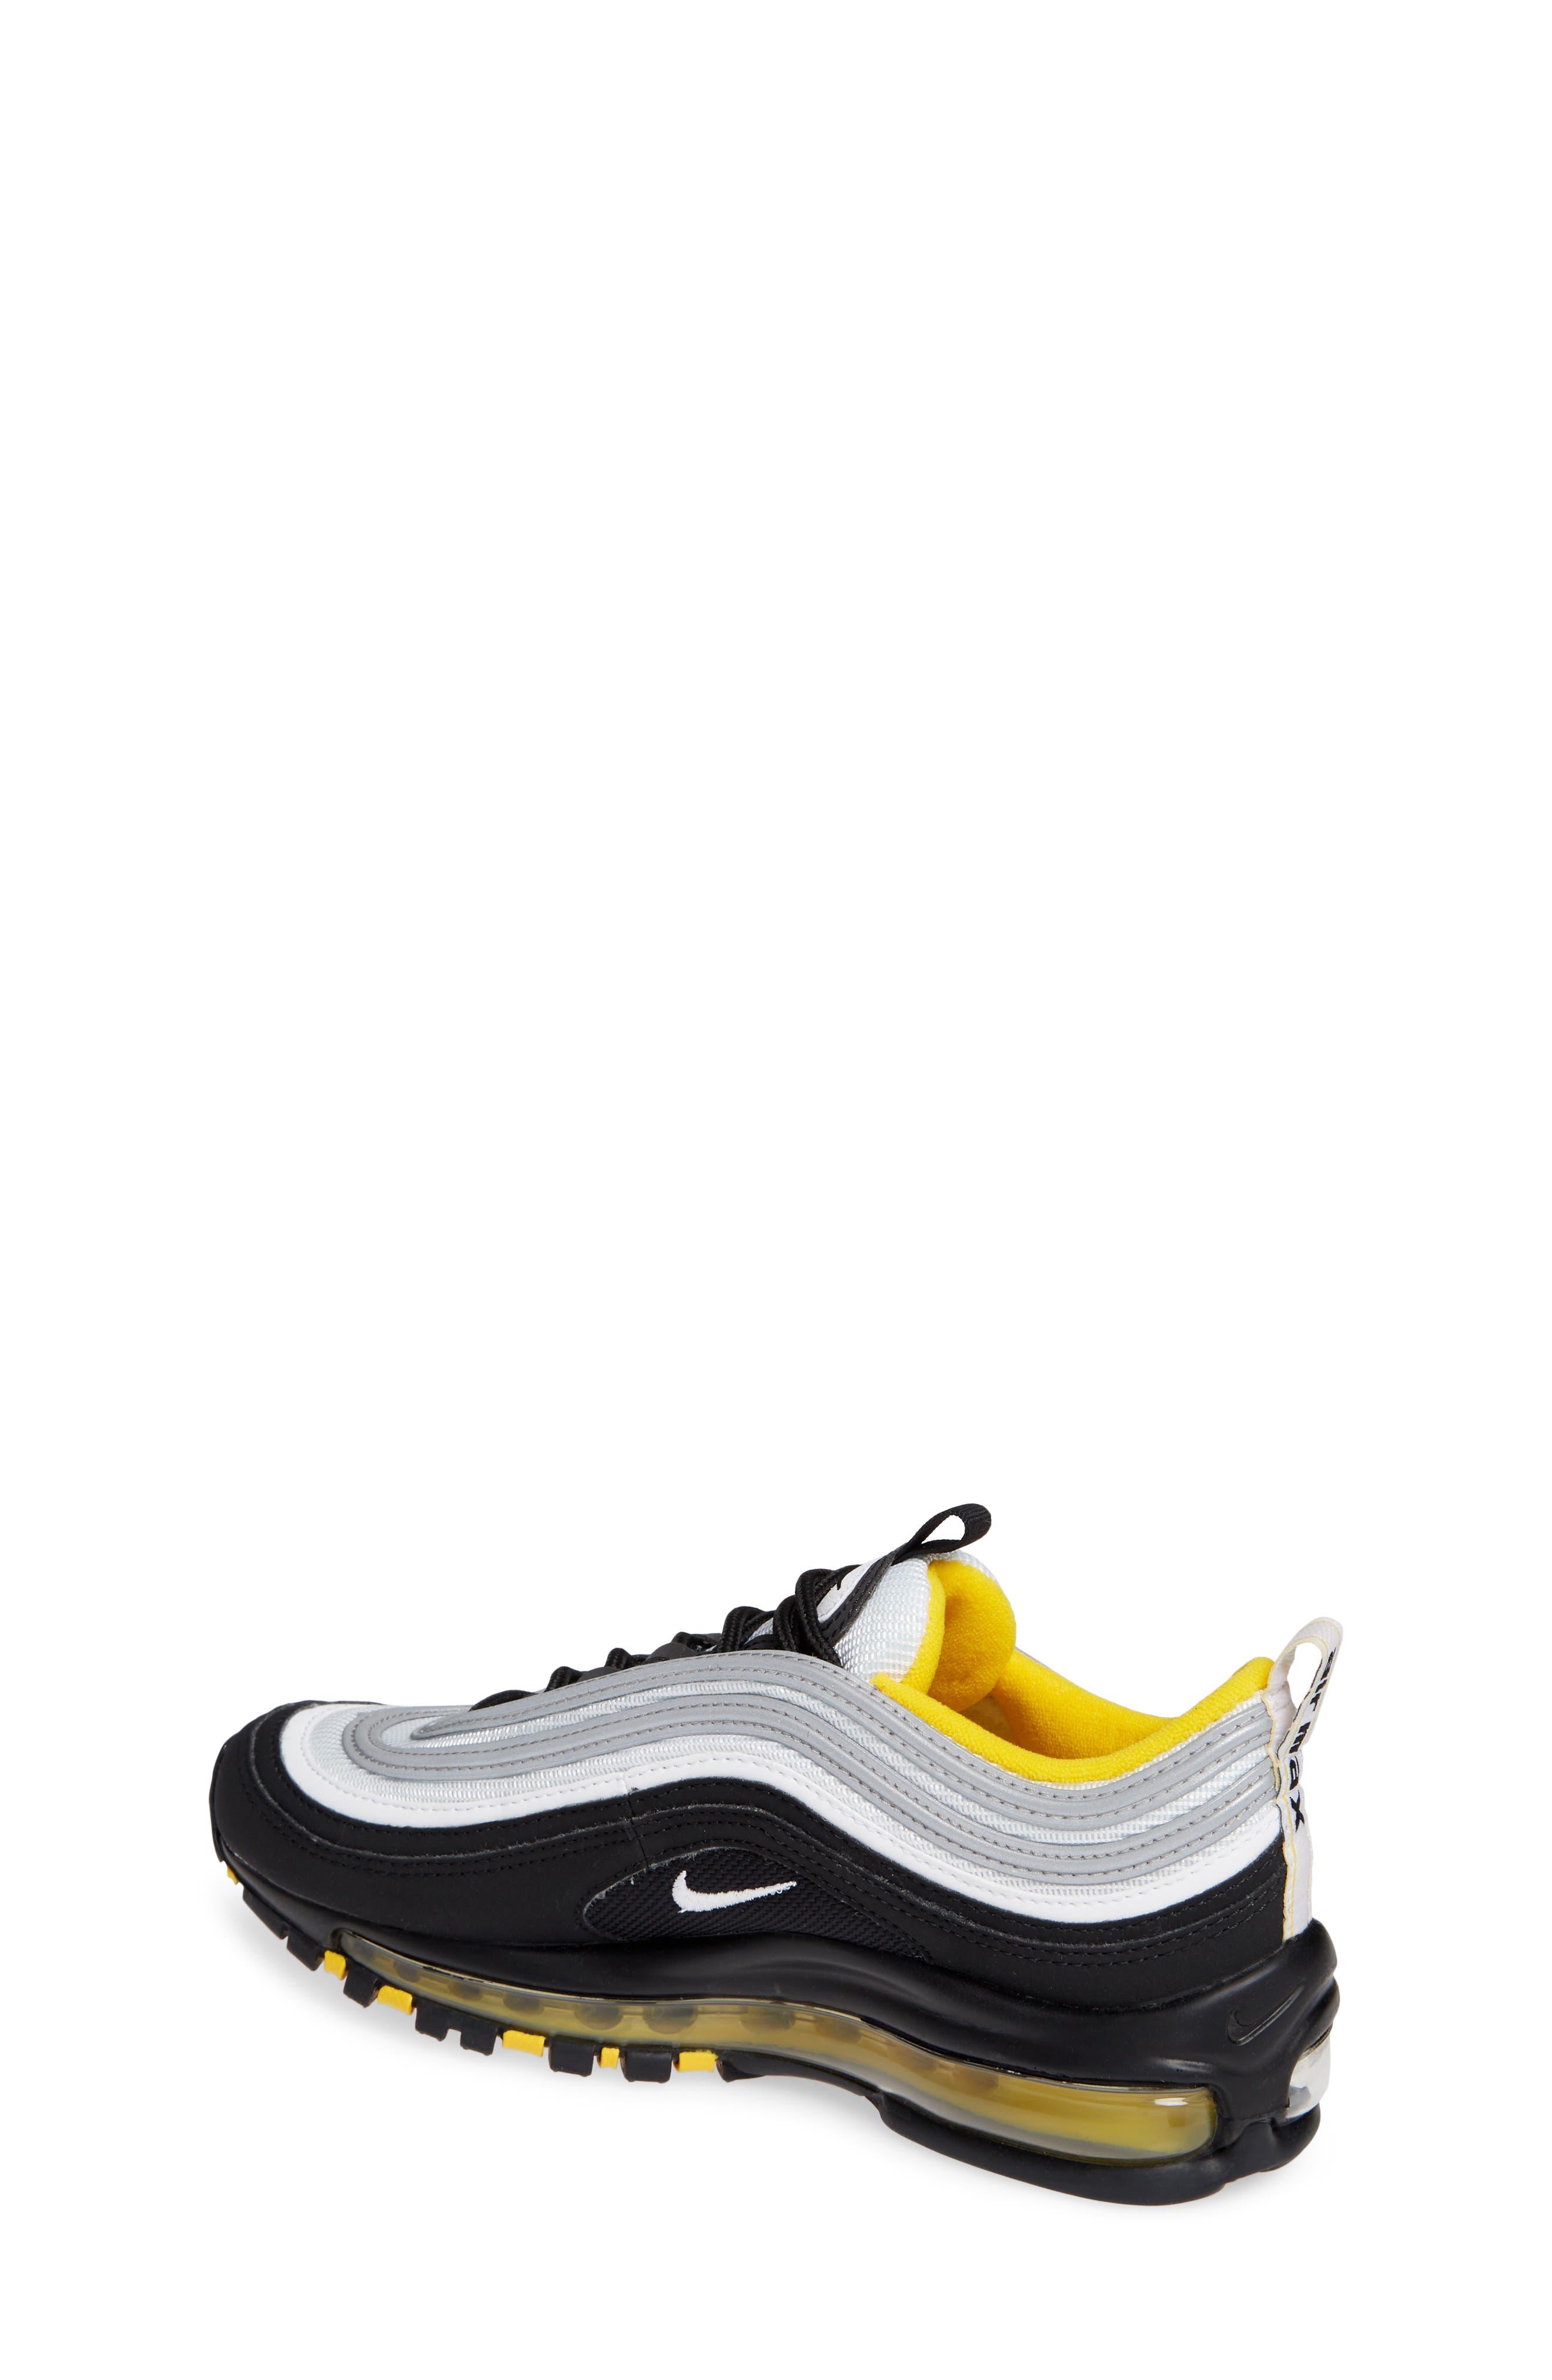 Air Max 97 Sneaker,                             Alternate thumbnail 2, color,                             BLACK/ WHITE/ AMARILLO